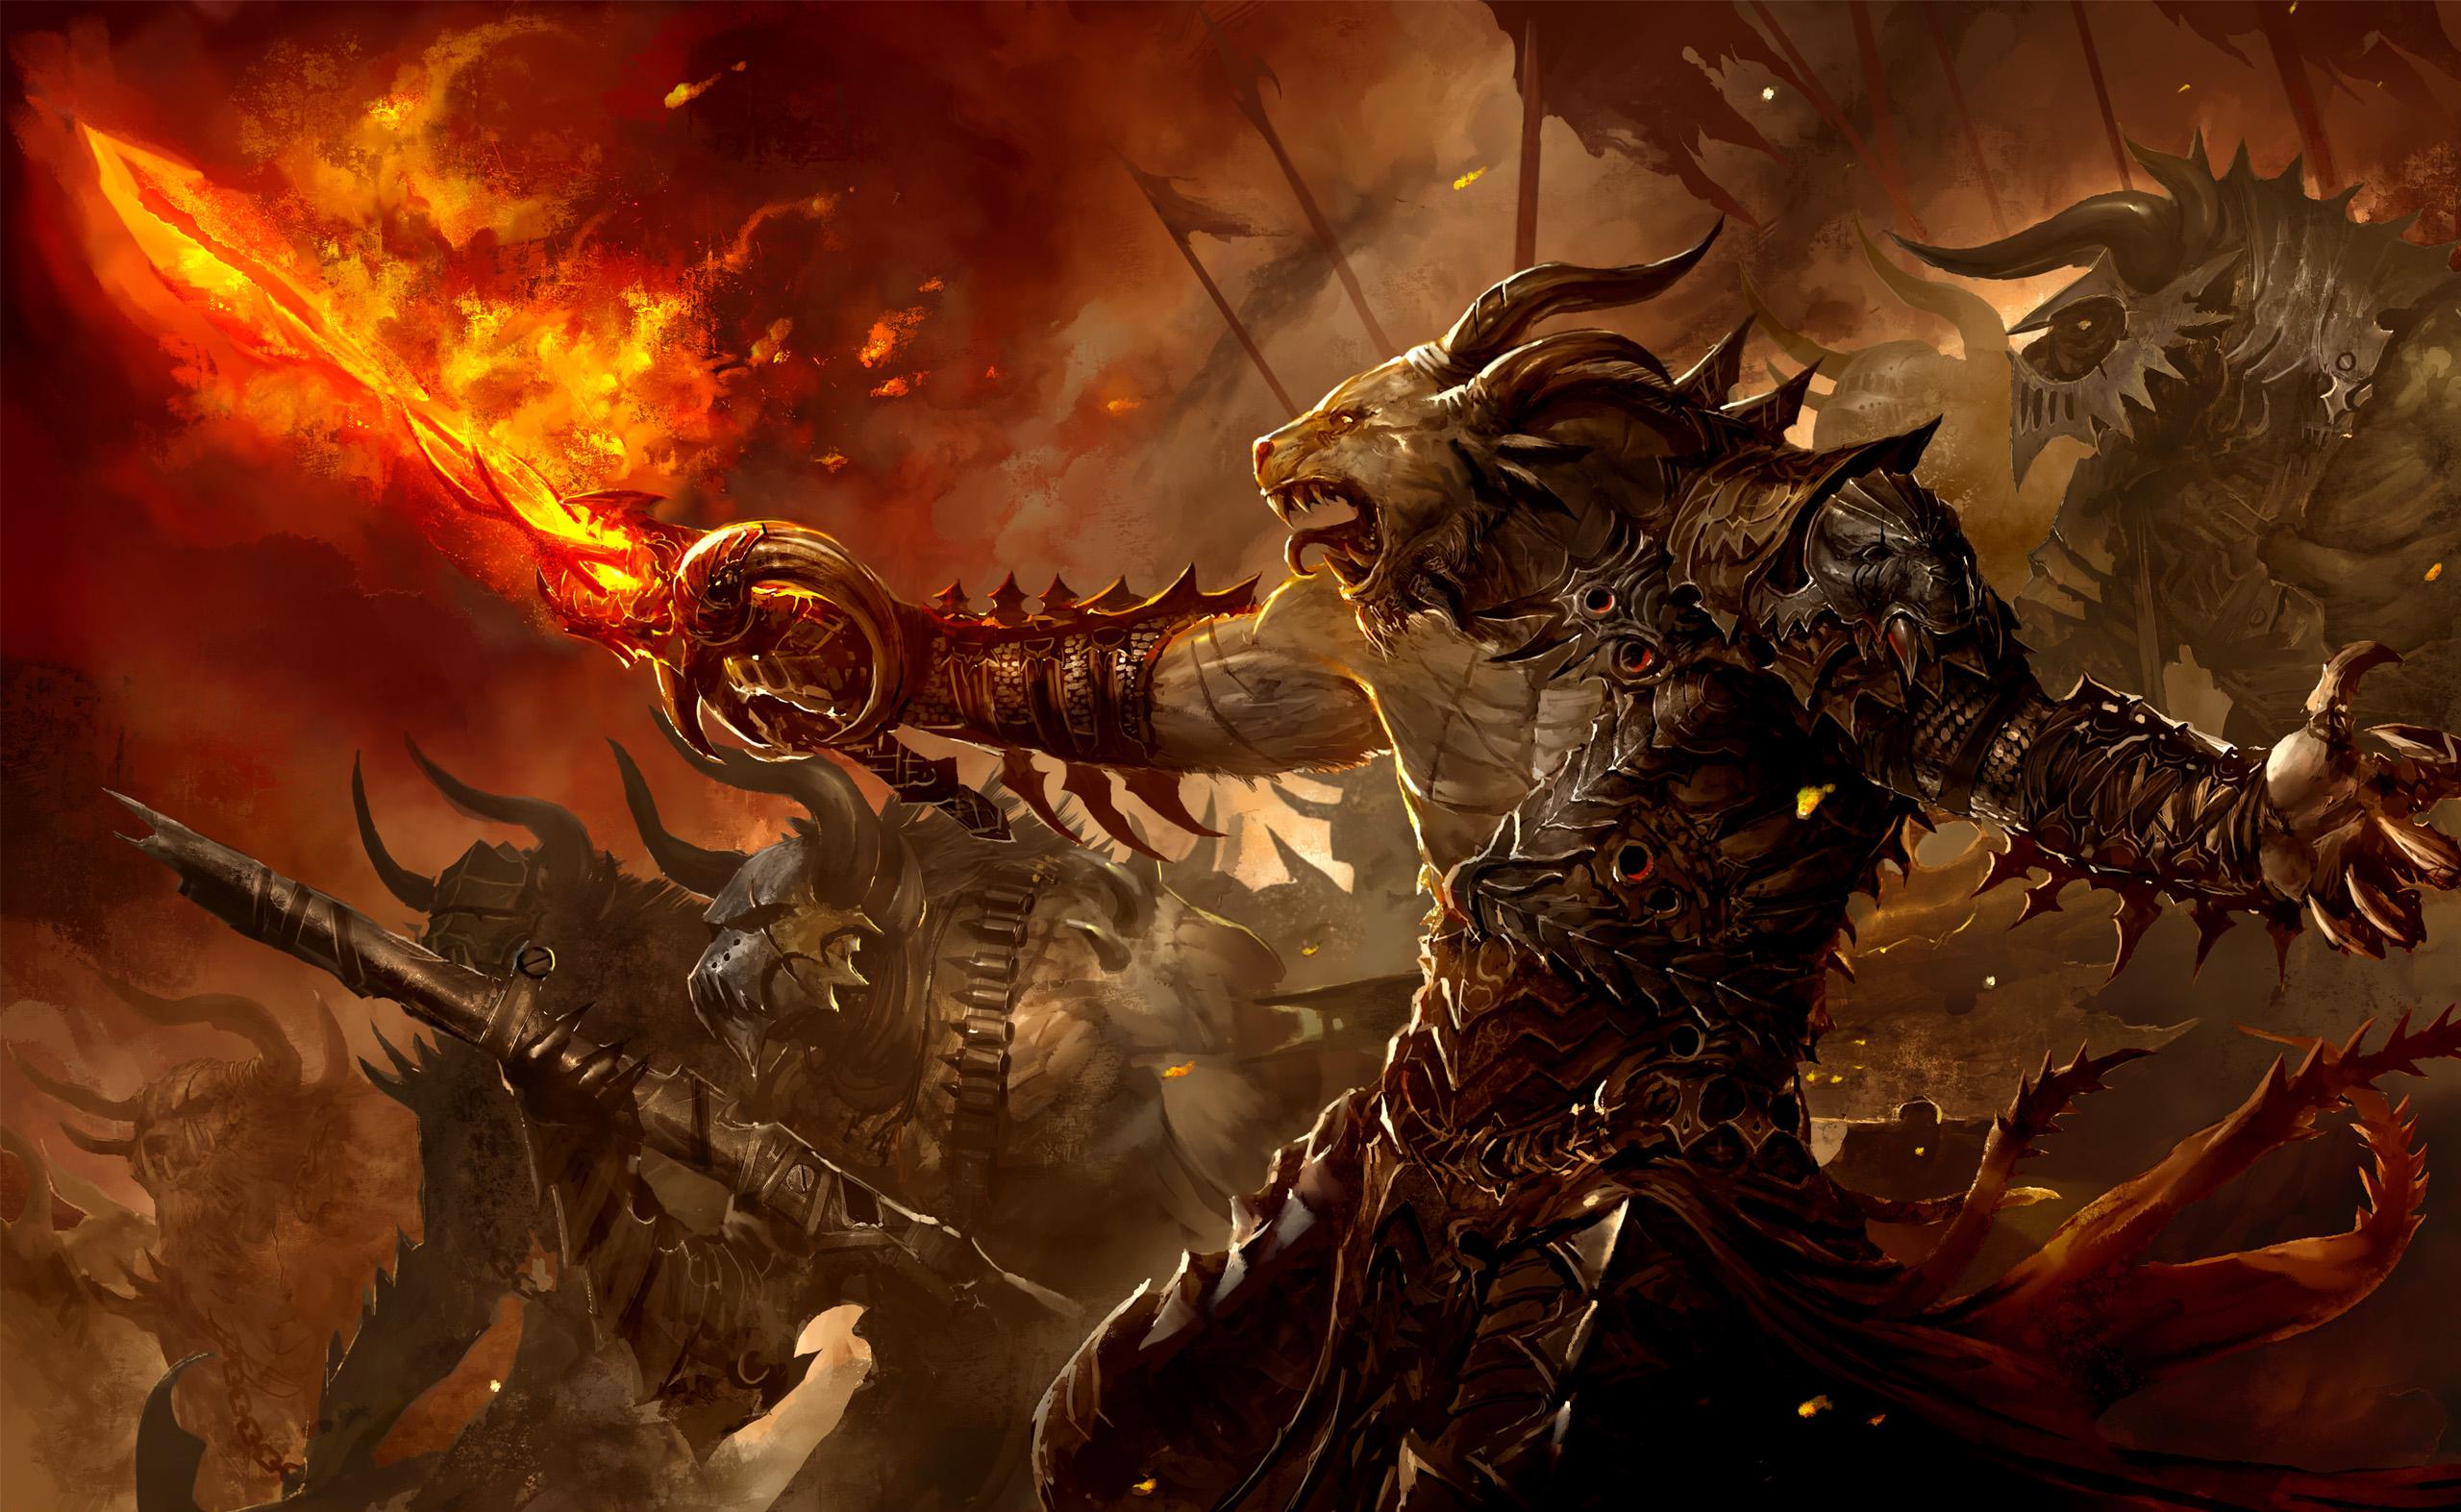 Flames army warrior soldiers dark scary evil art battle war wallpaper